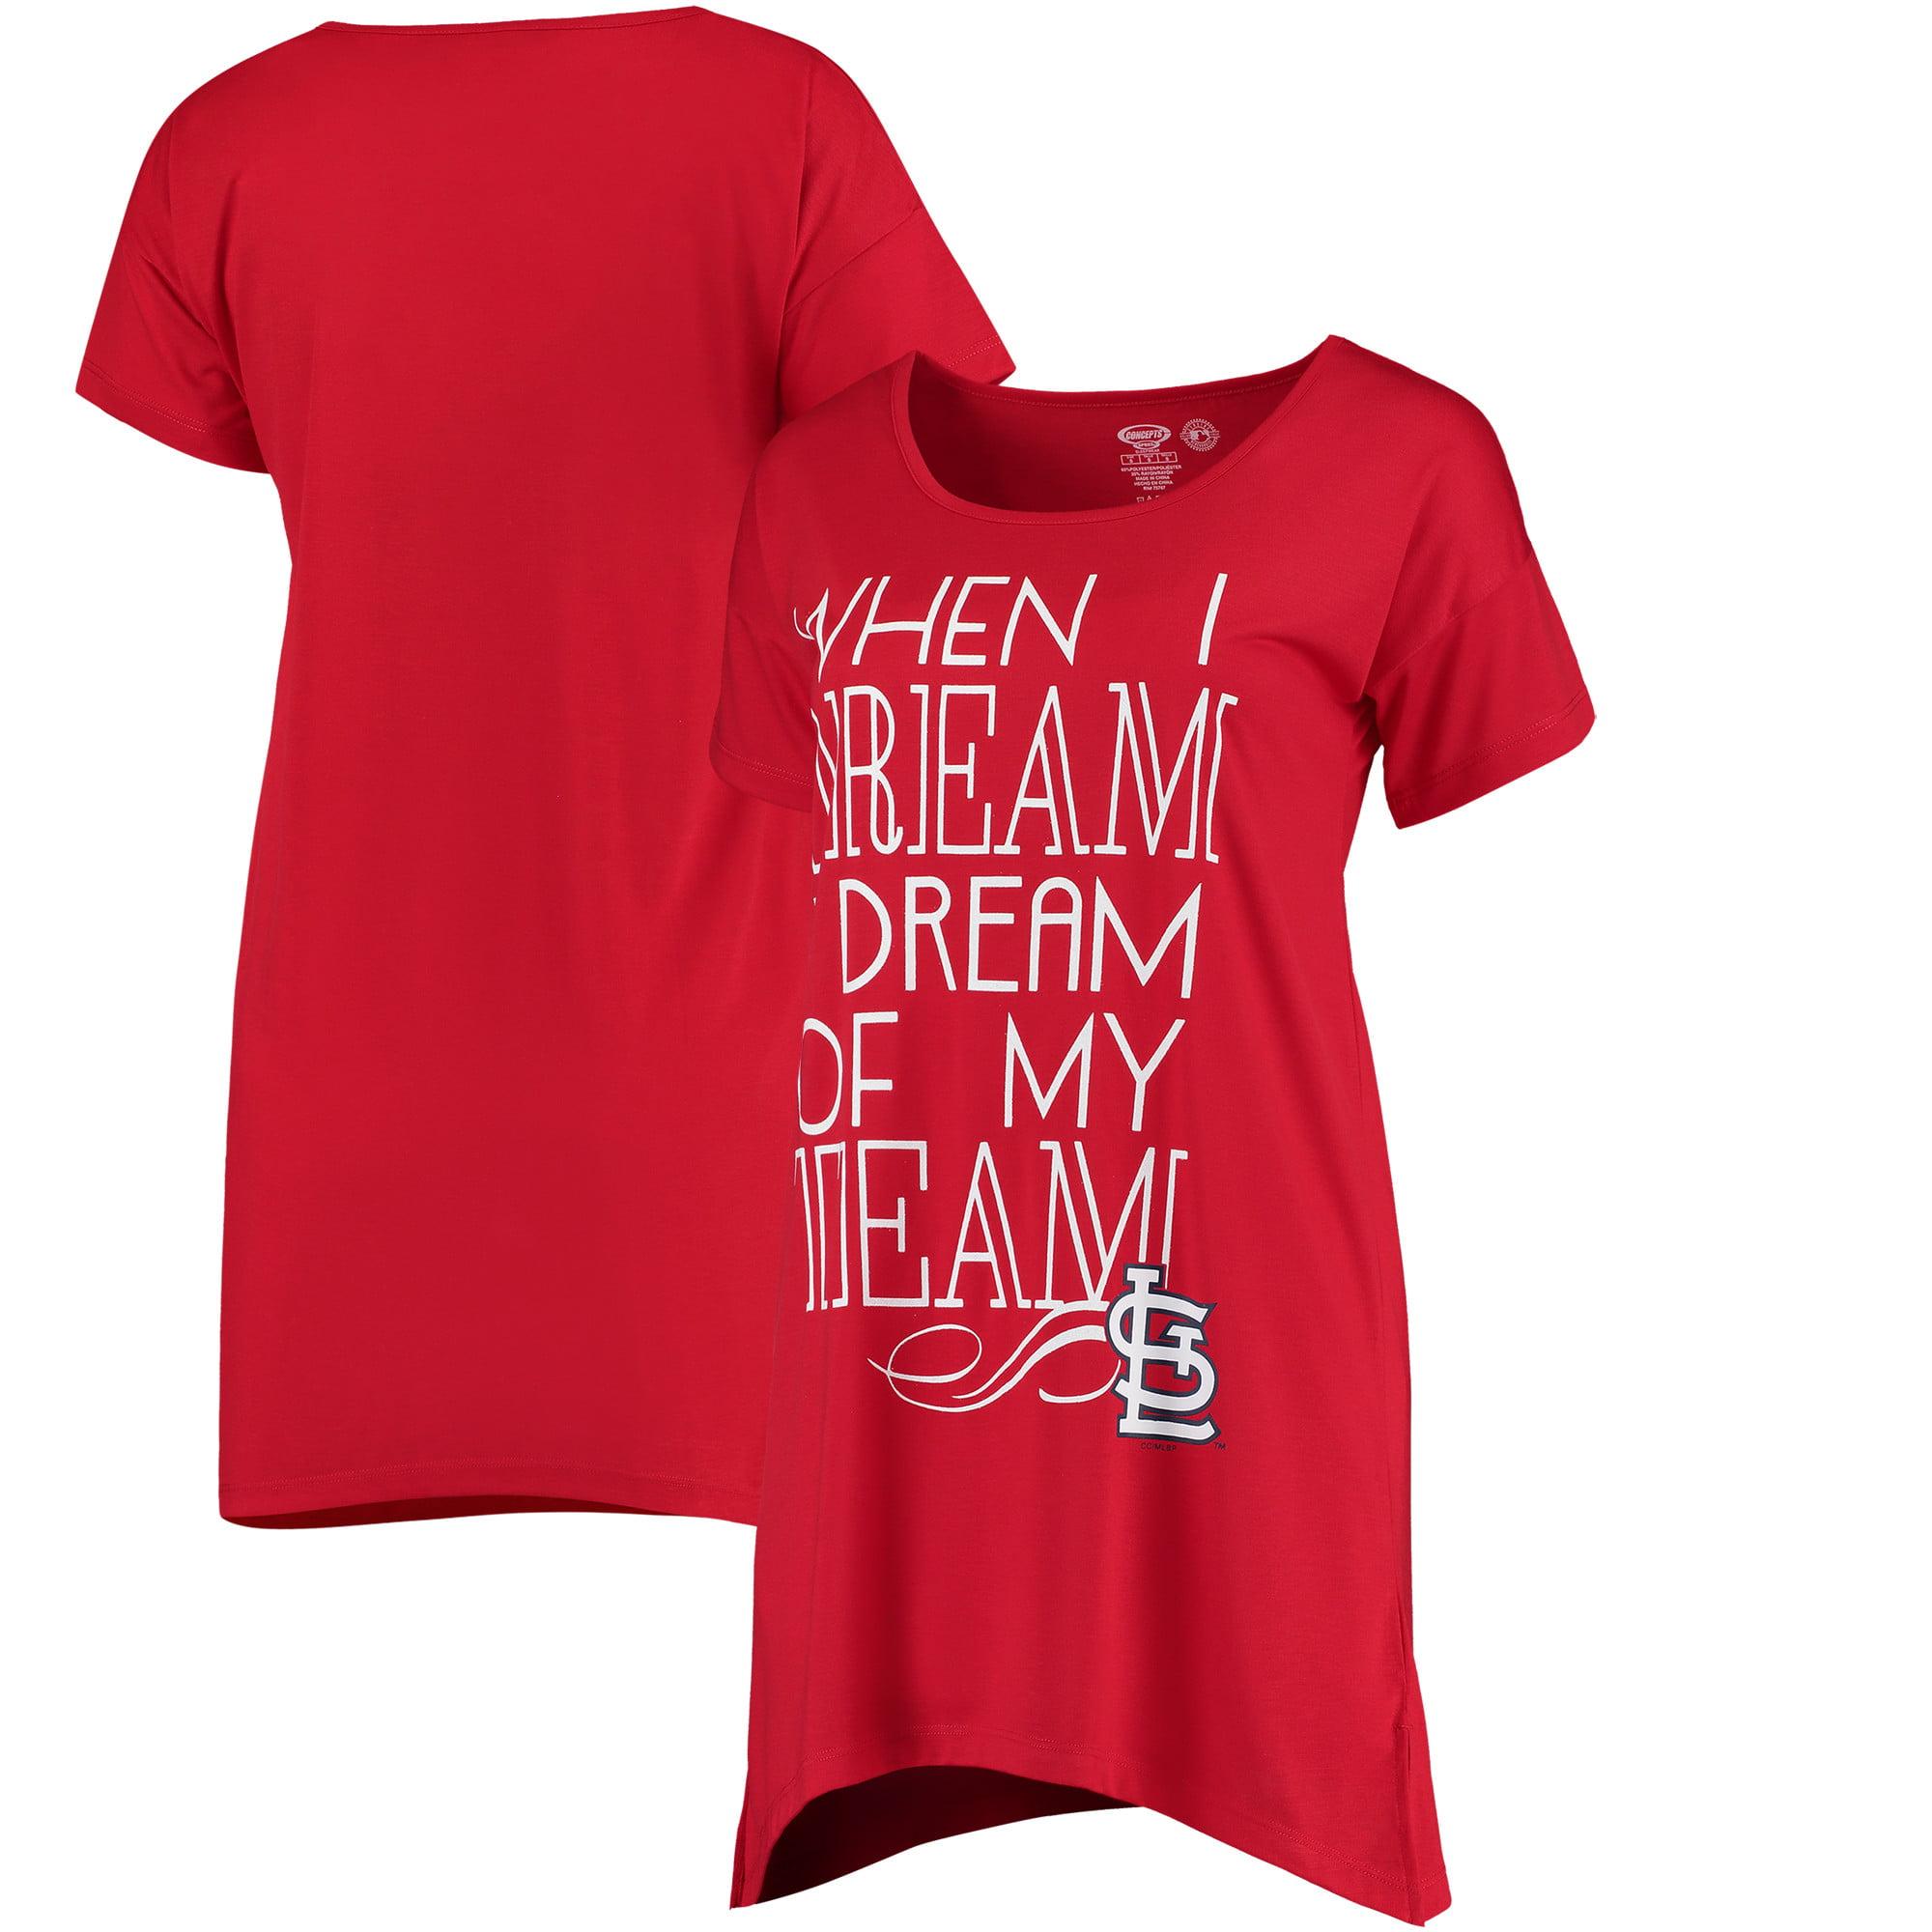 St. Louis Cardinals Concepts Sport Women's Transcend Nightshirt - Red